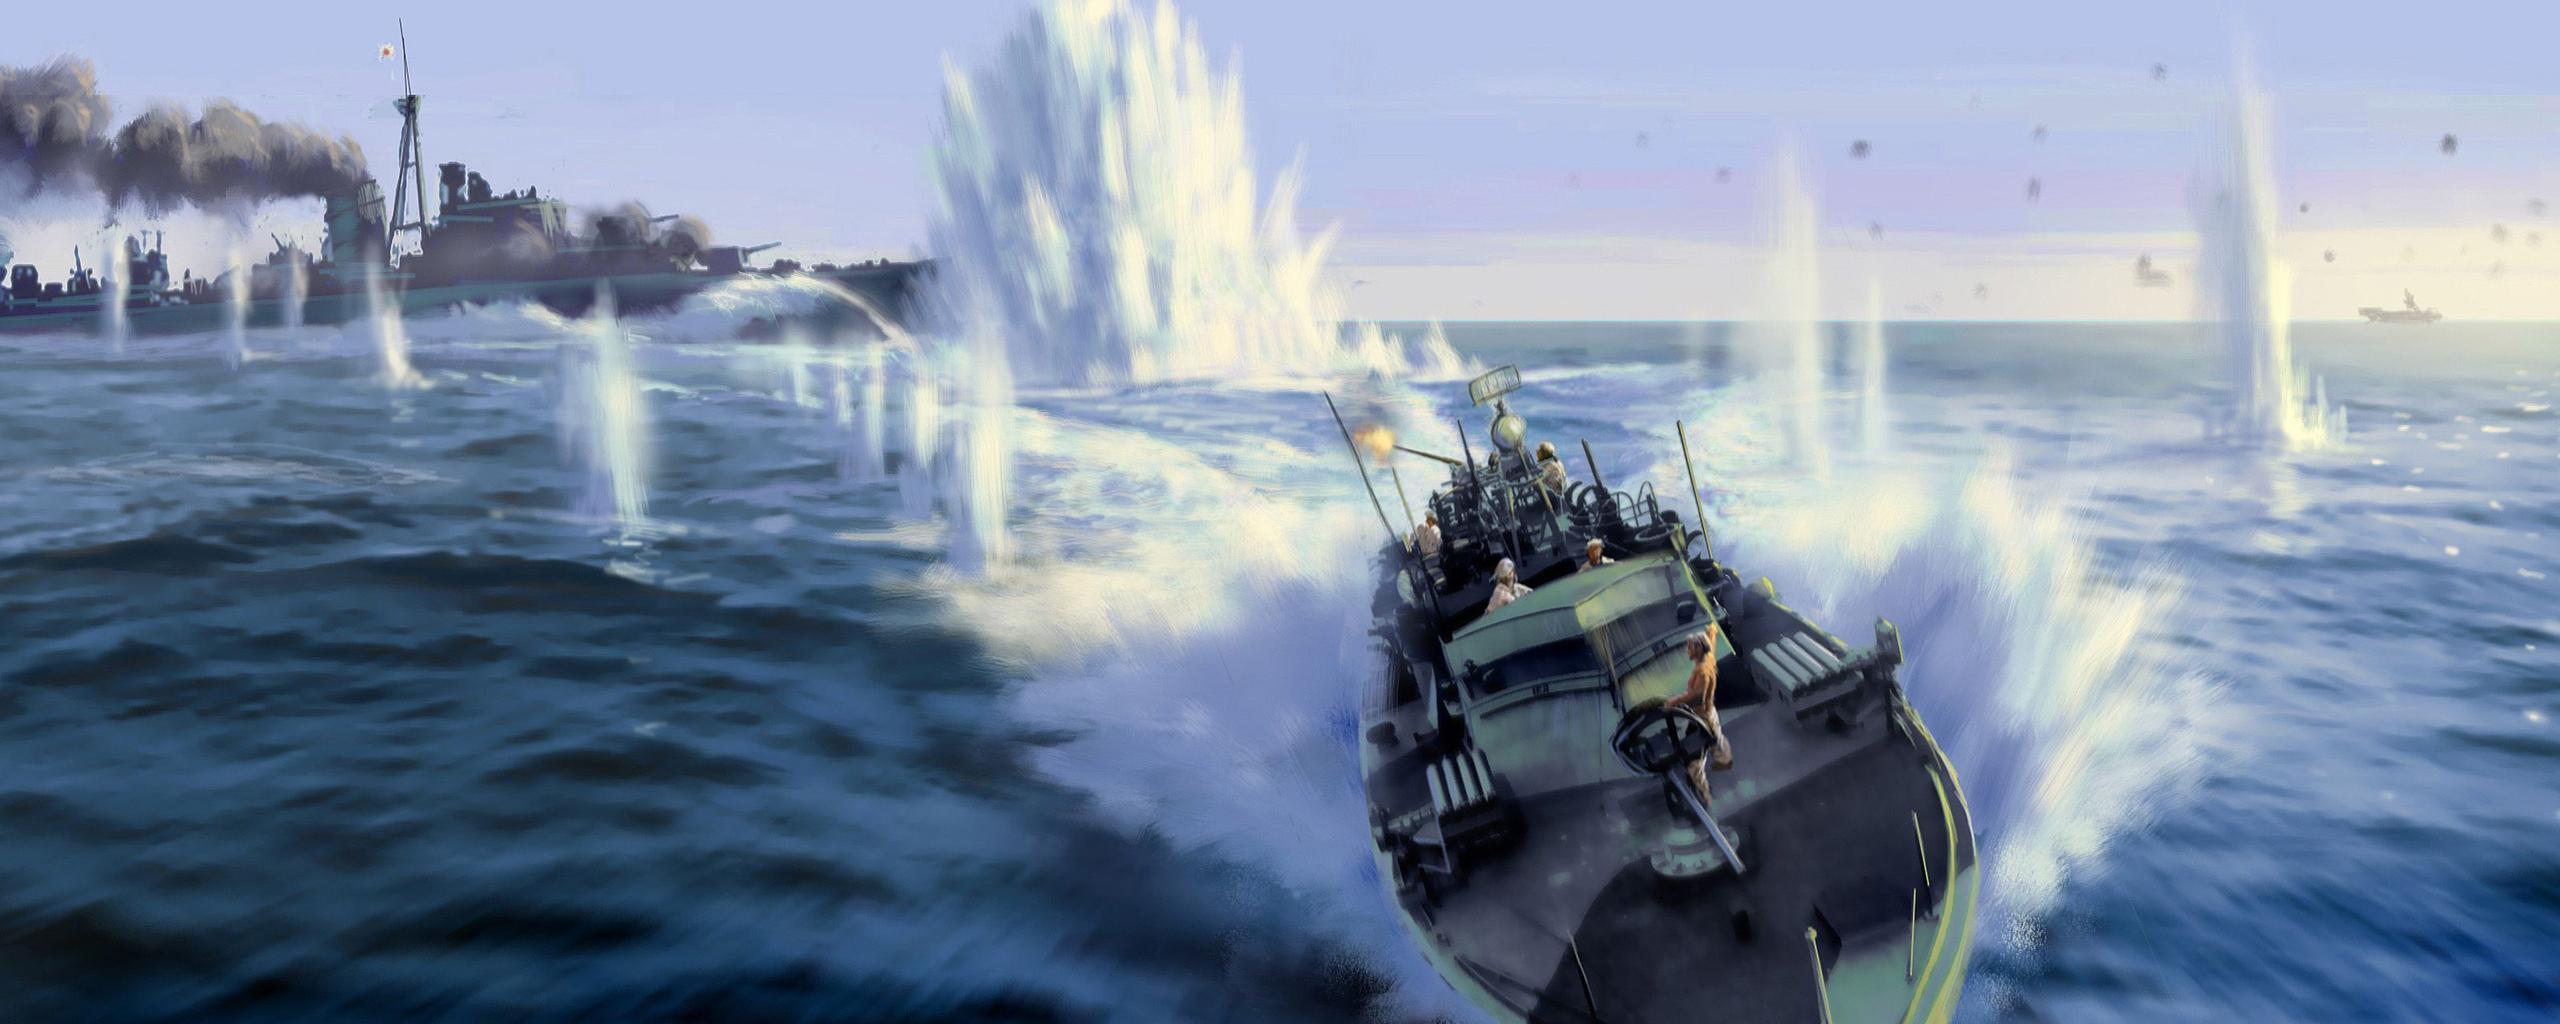 Militär - Künstlerisch  Wallpaper